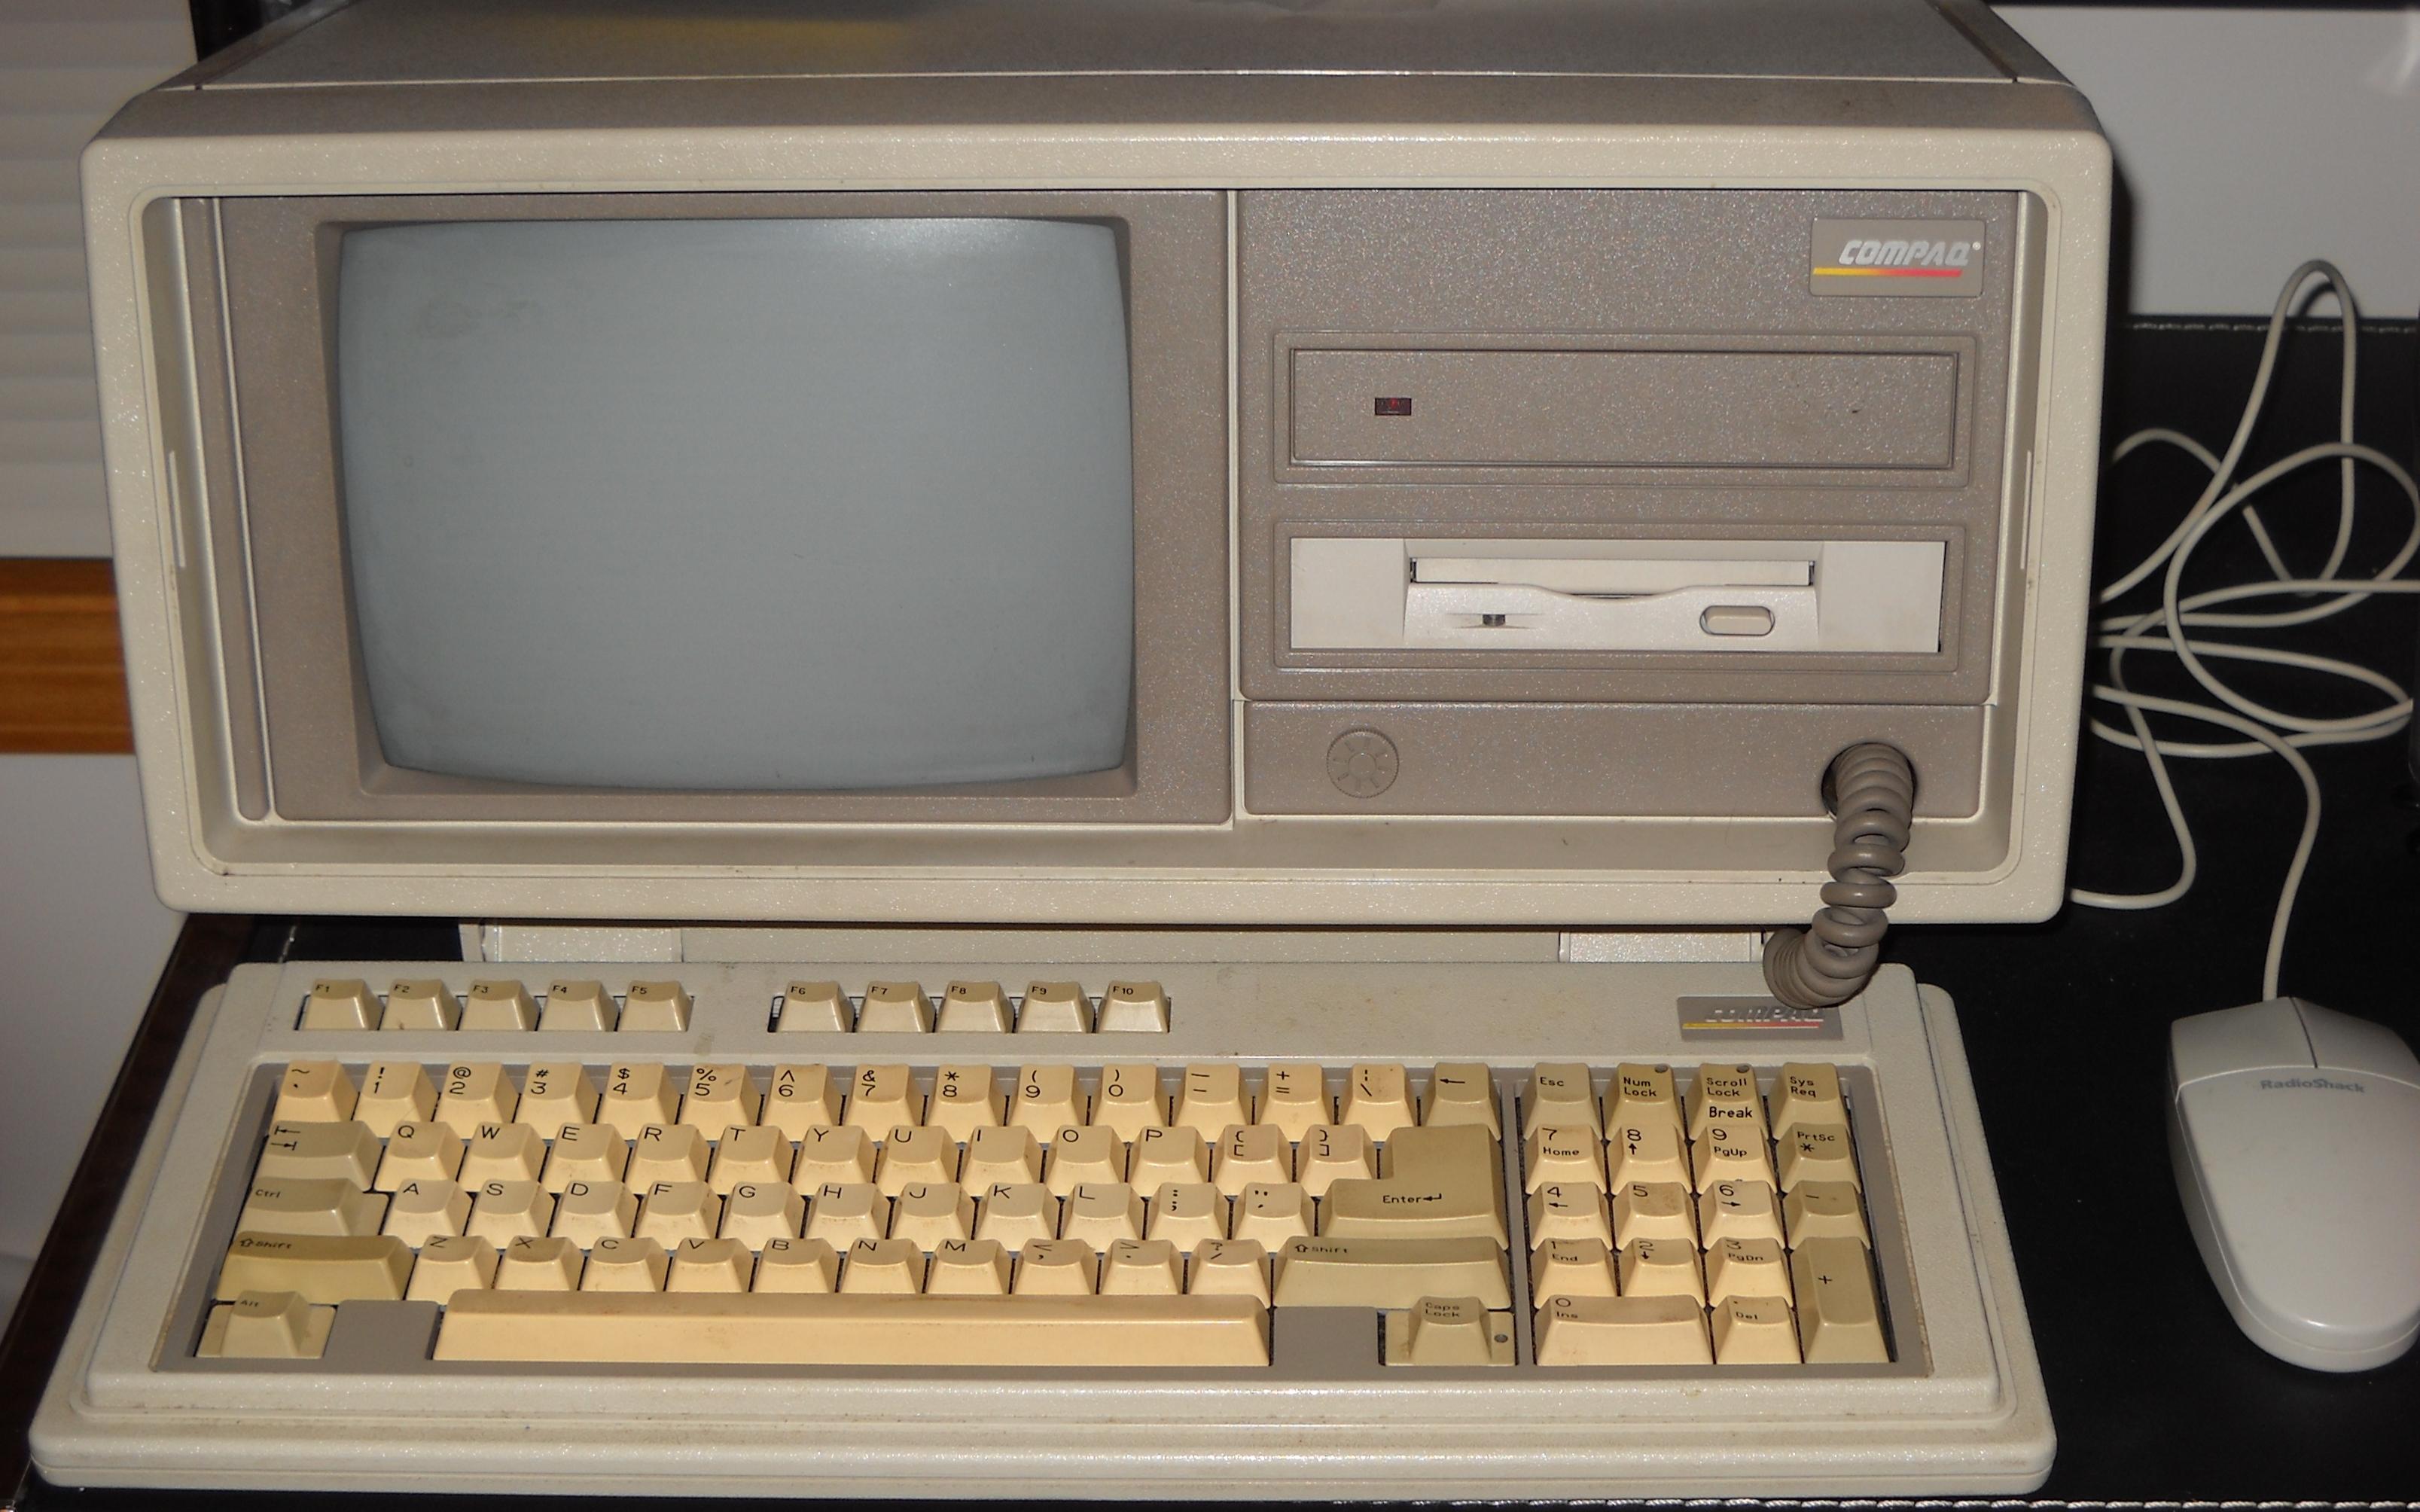 Compaq Portable II - Wikipedia